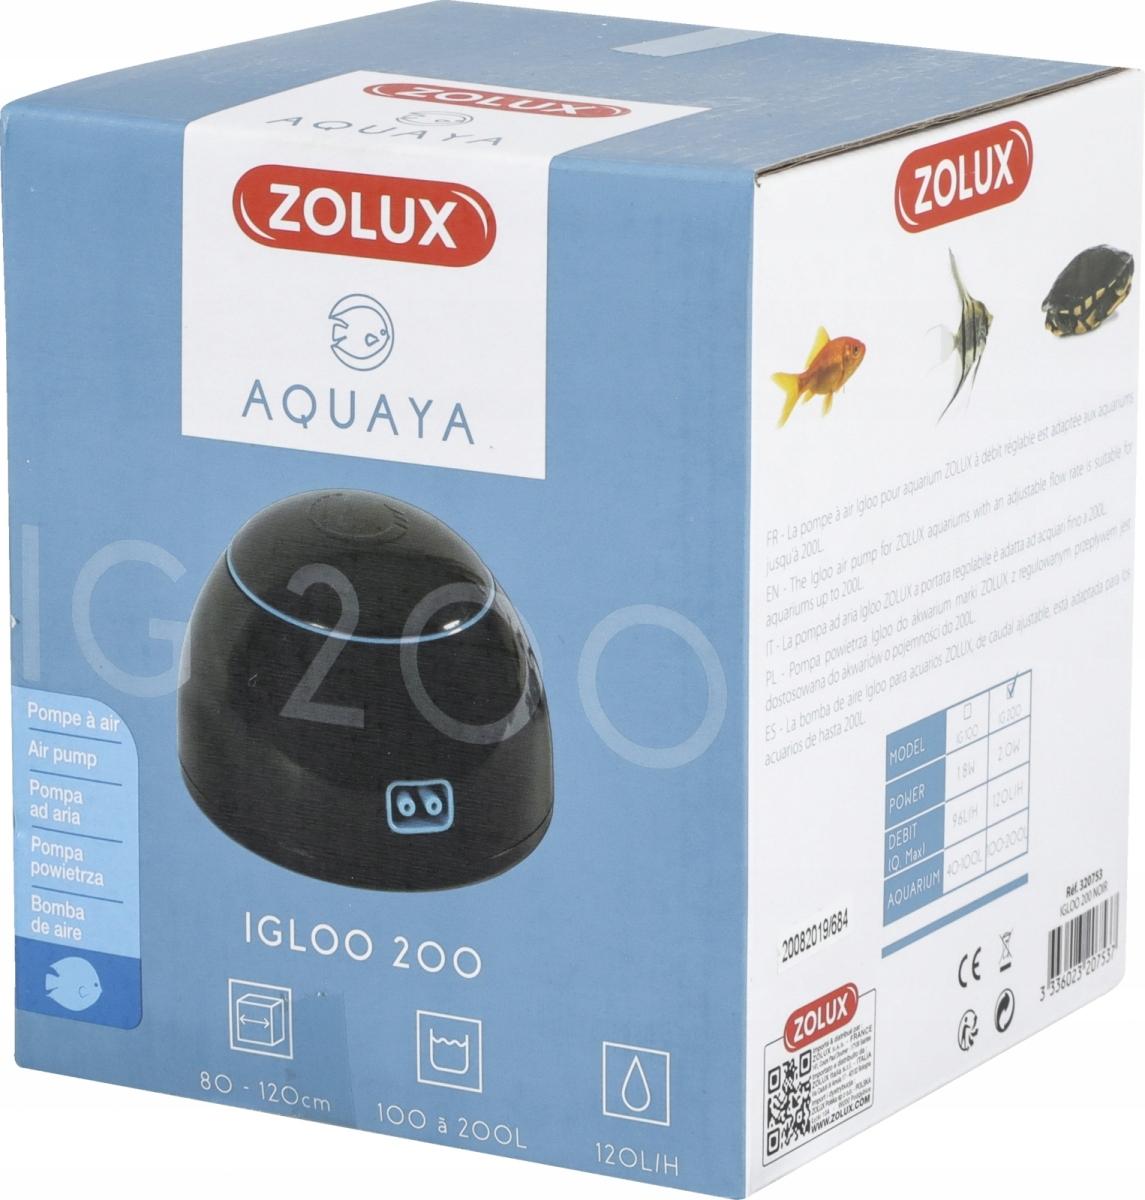 Zolux Iglu Aquaya 200 - čerpadlo nap.- farba čierna